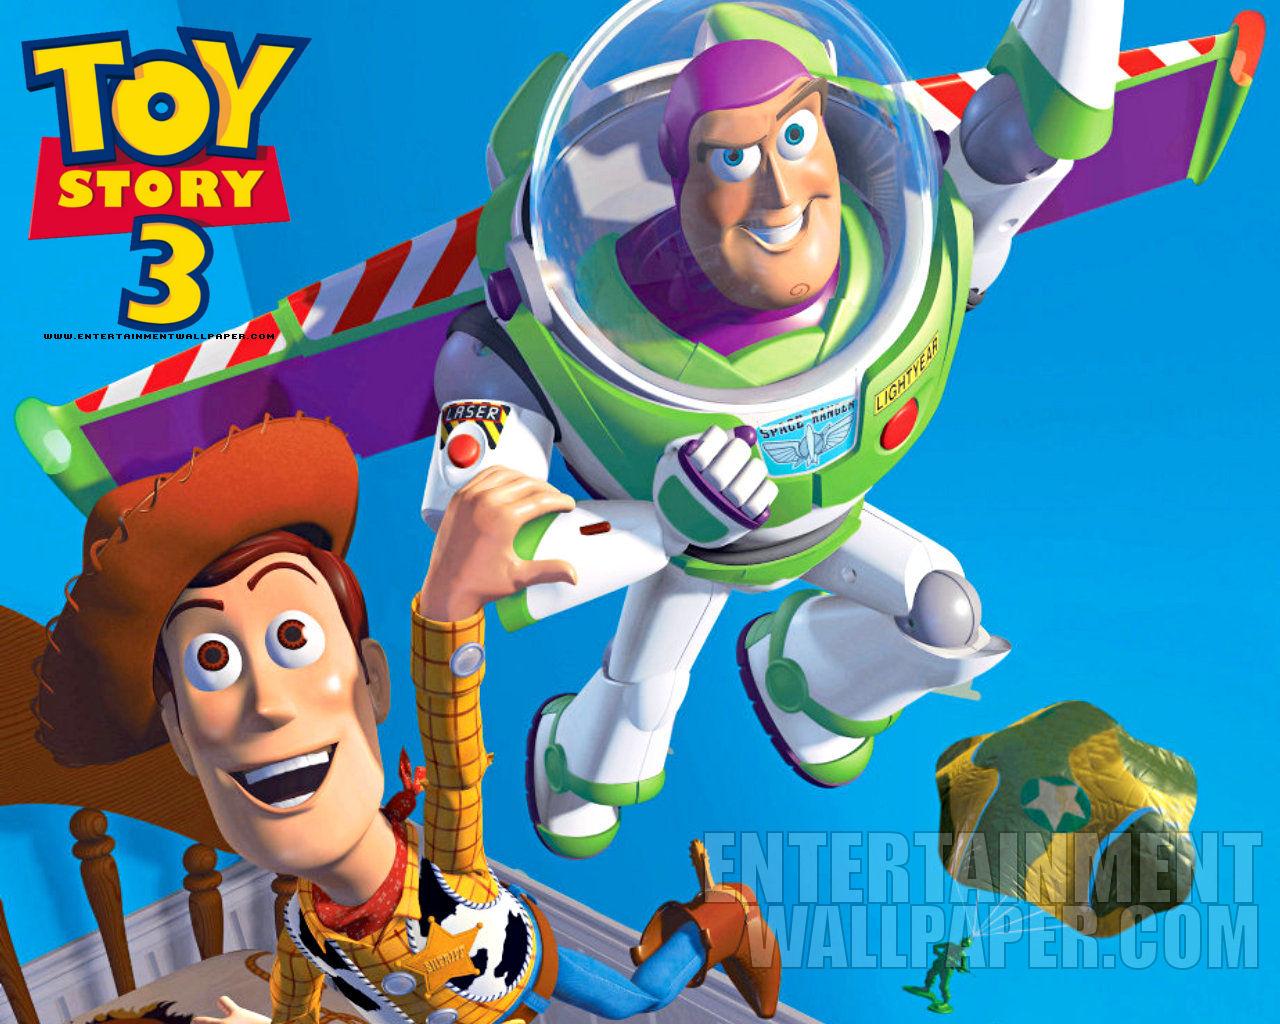 DJan-ity: Toy Story 3